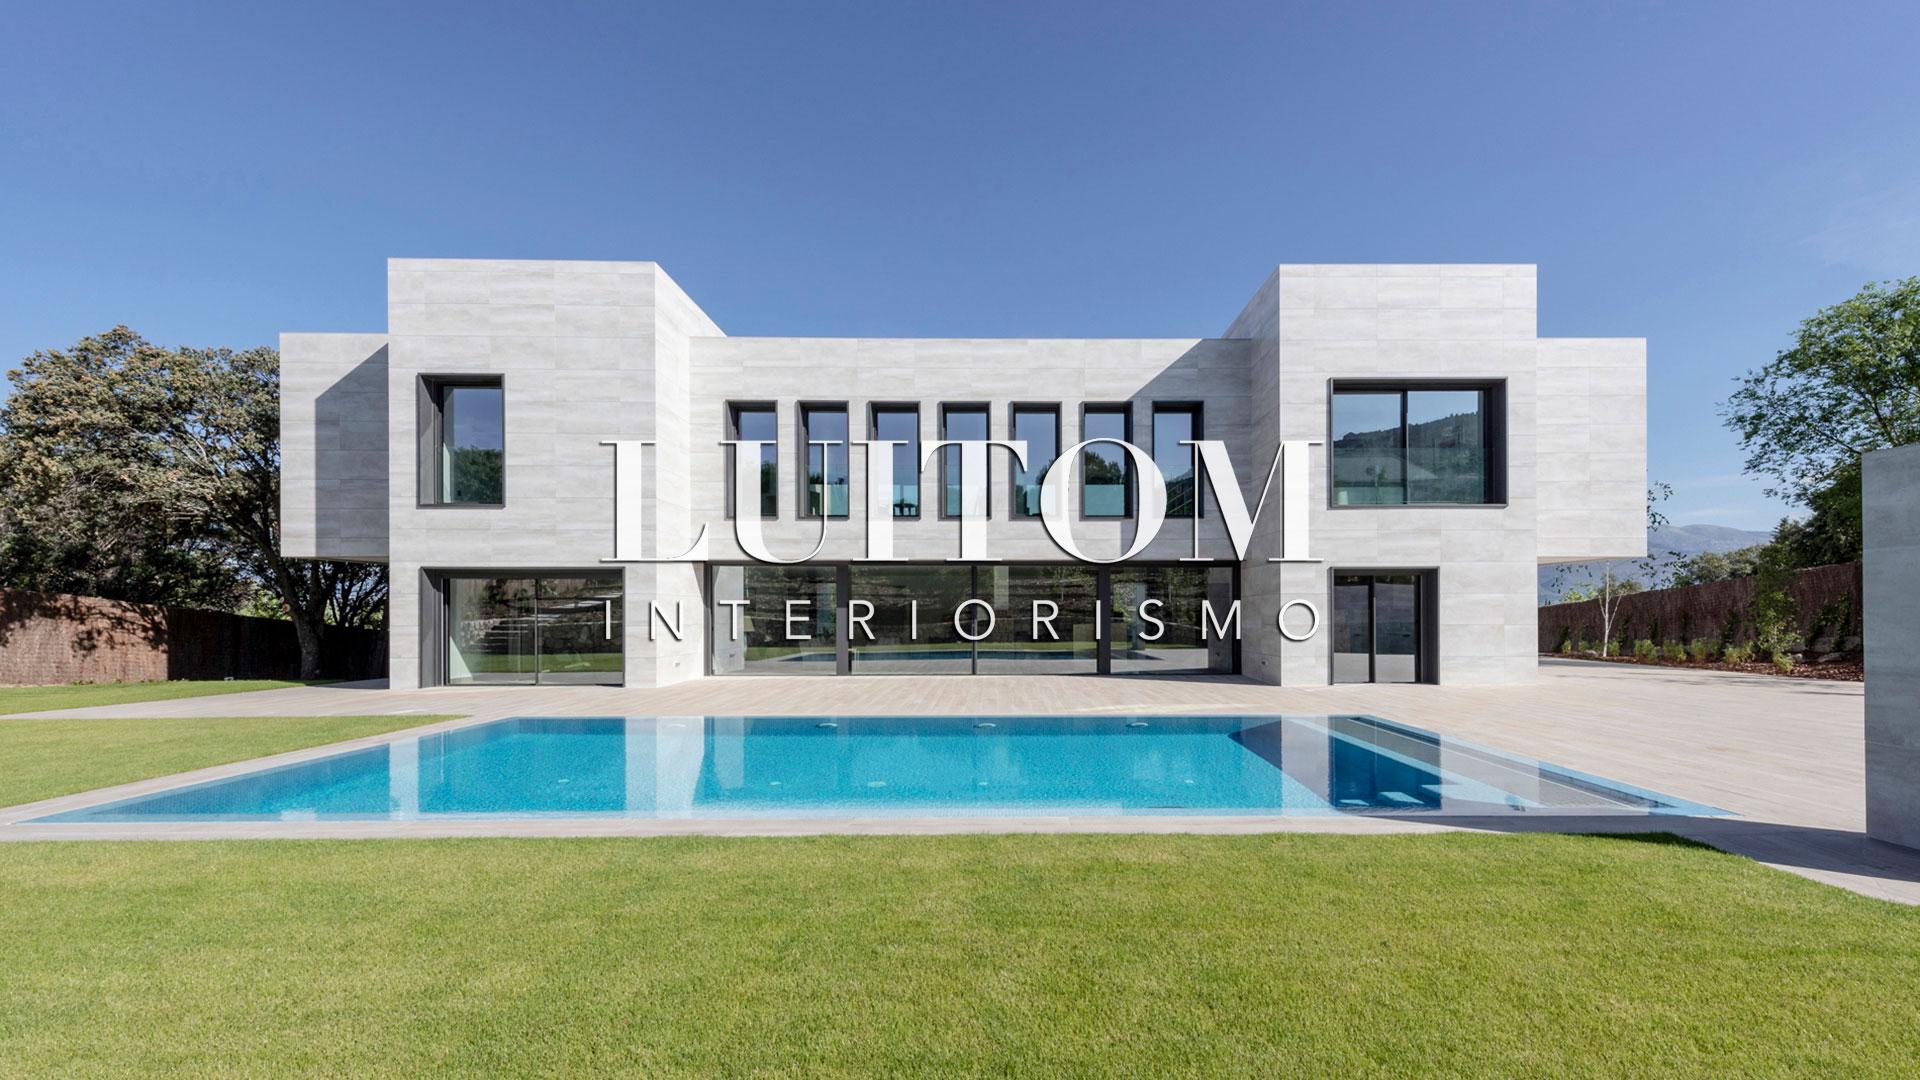 luitom-interiorismo-arquitectura-casas-modernas-lujo-arquitectos-interioristas-decoradores-madrid-04